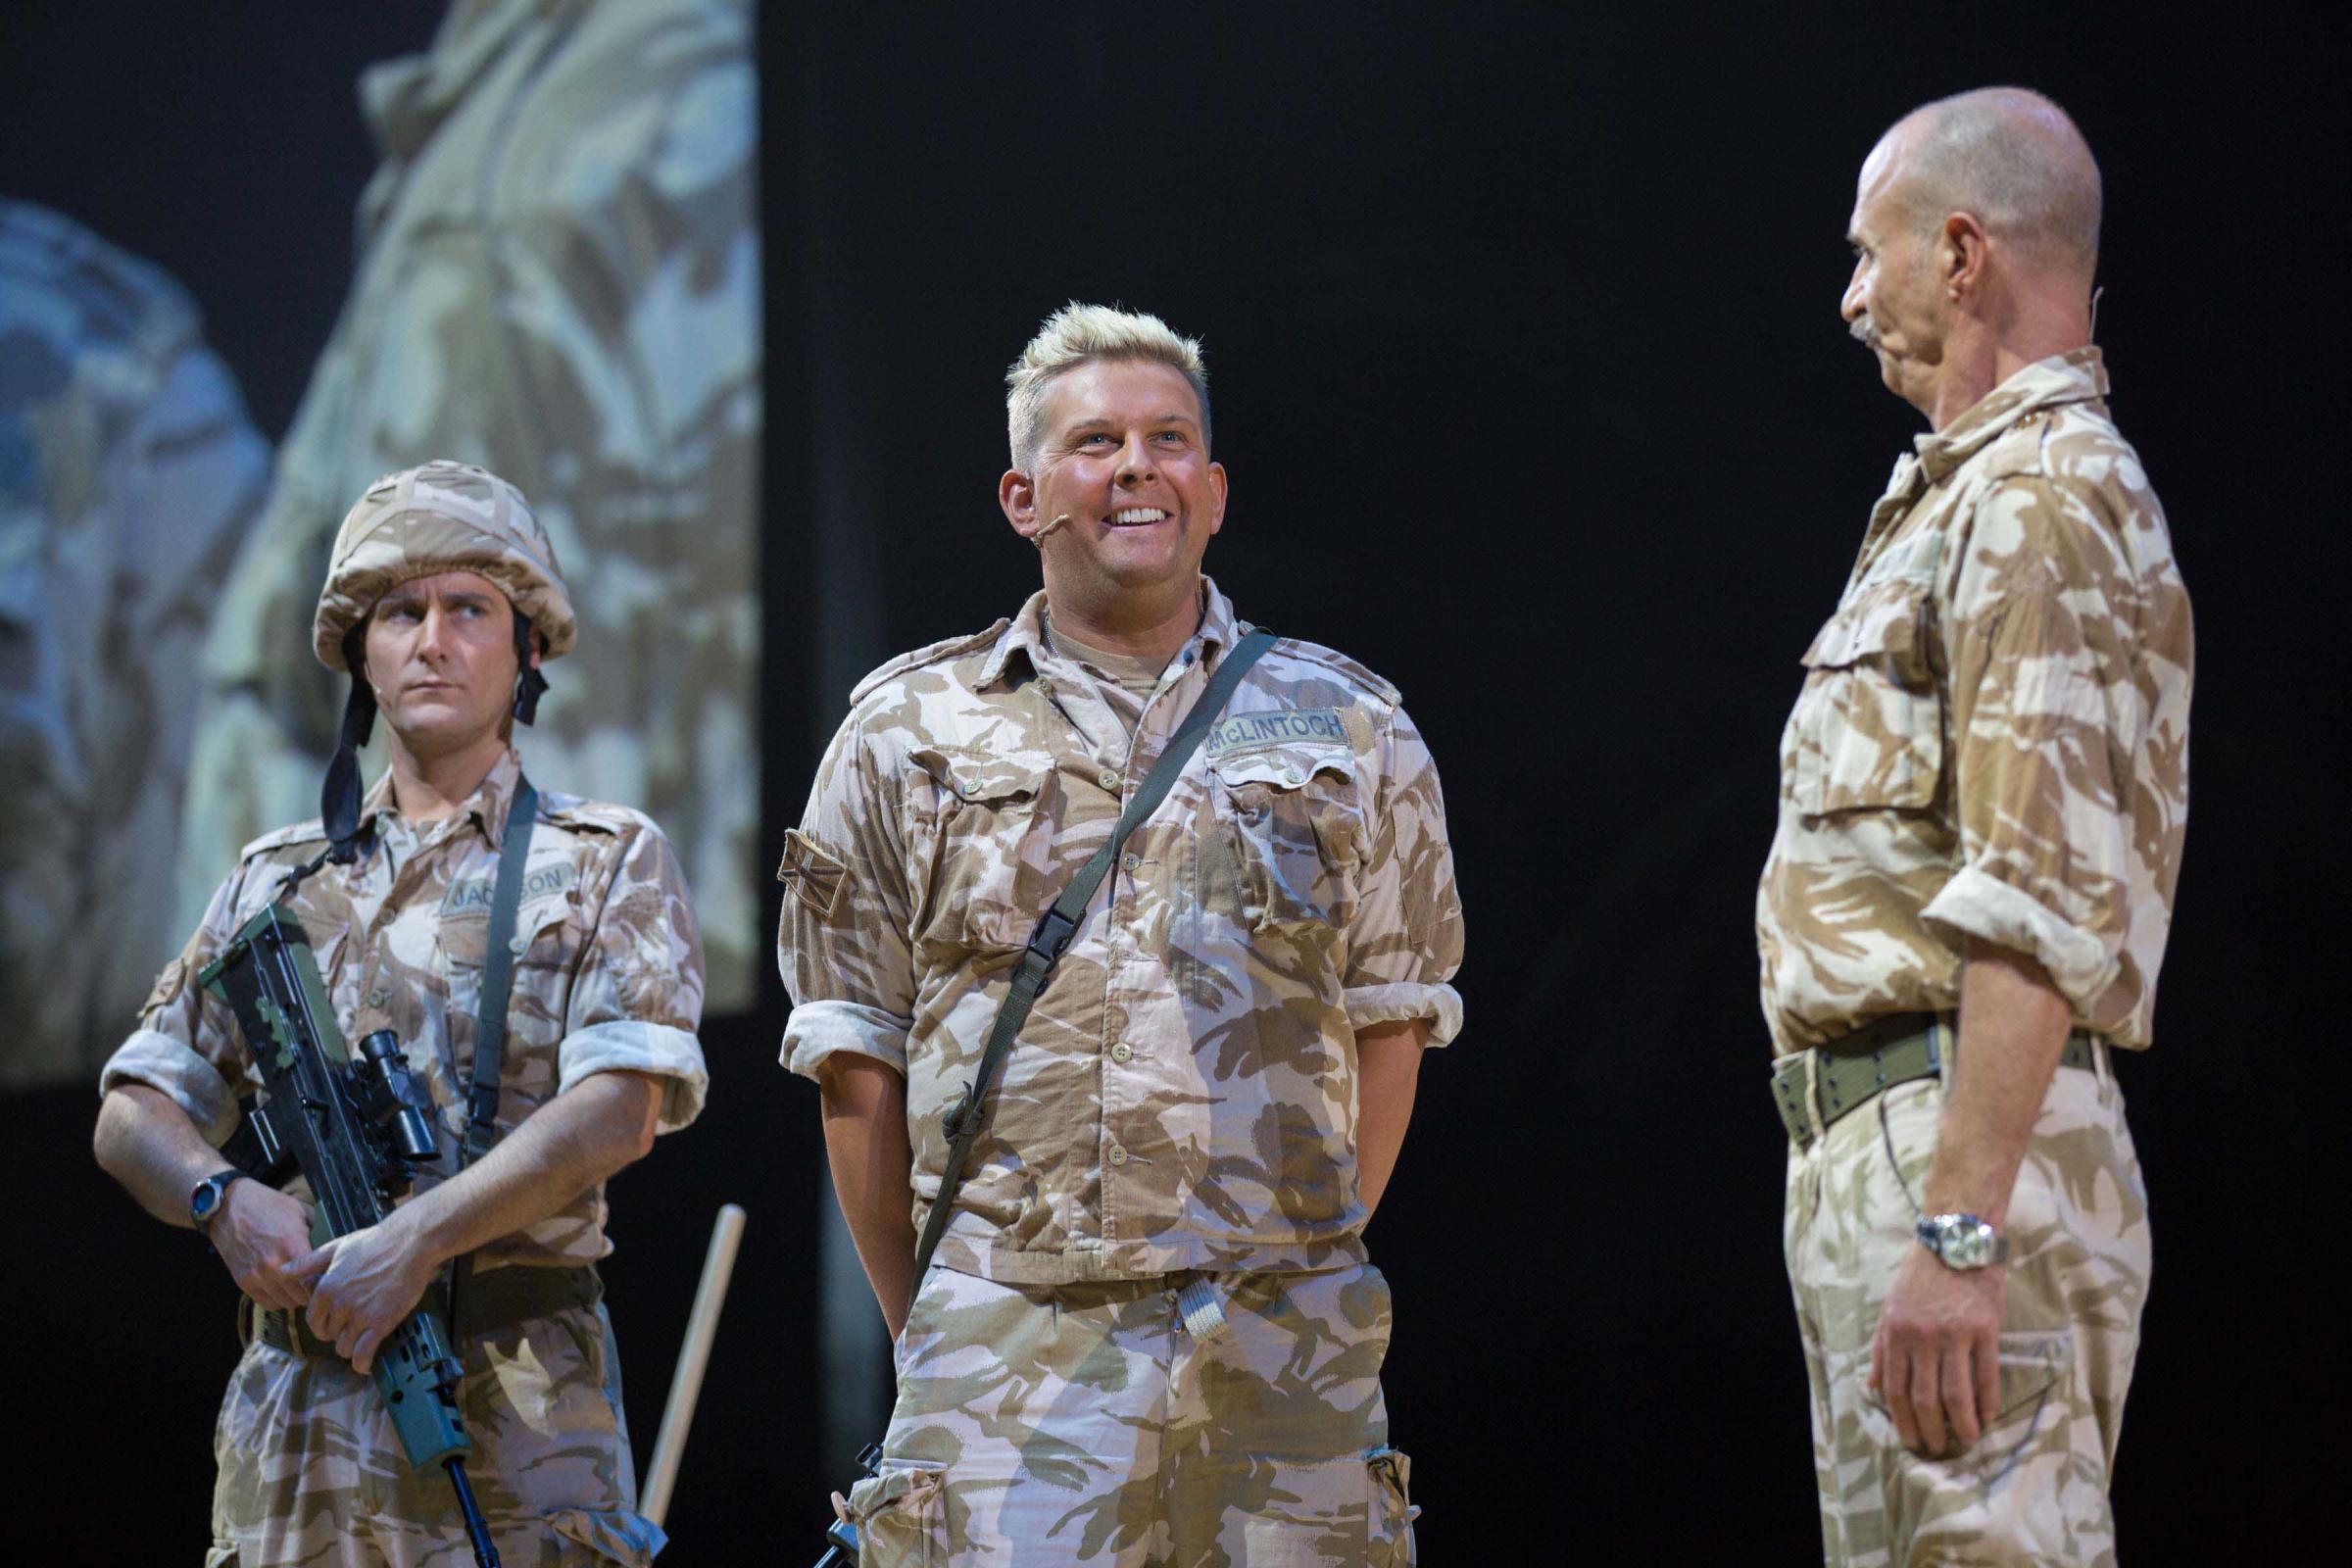 Gary Tank Commander to return to Snow White panto at Glasgow's SEC